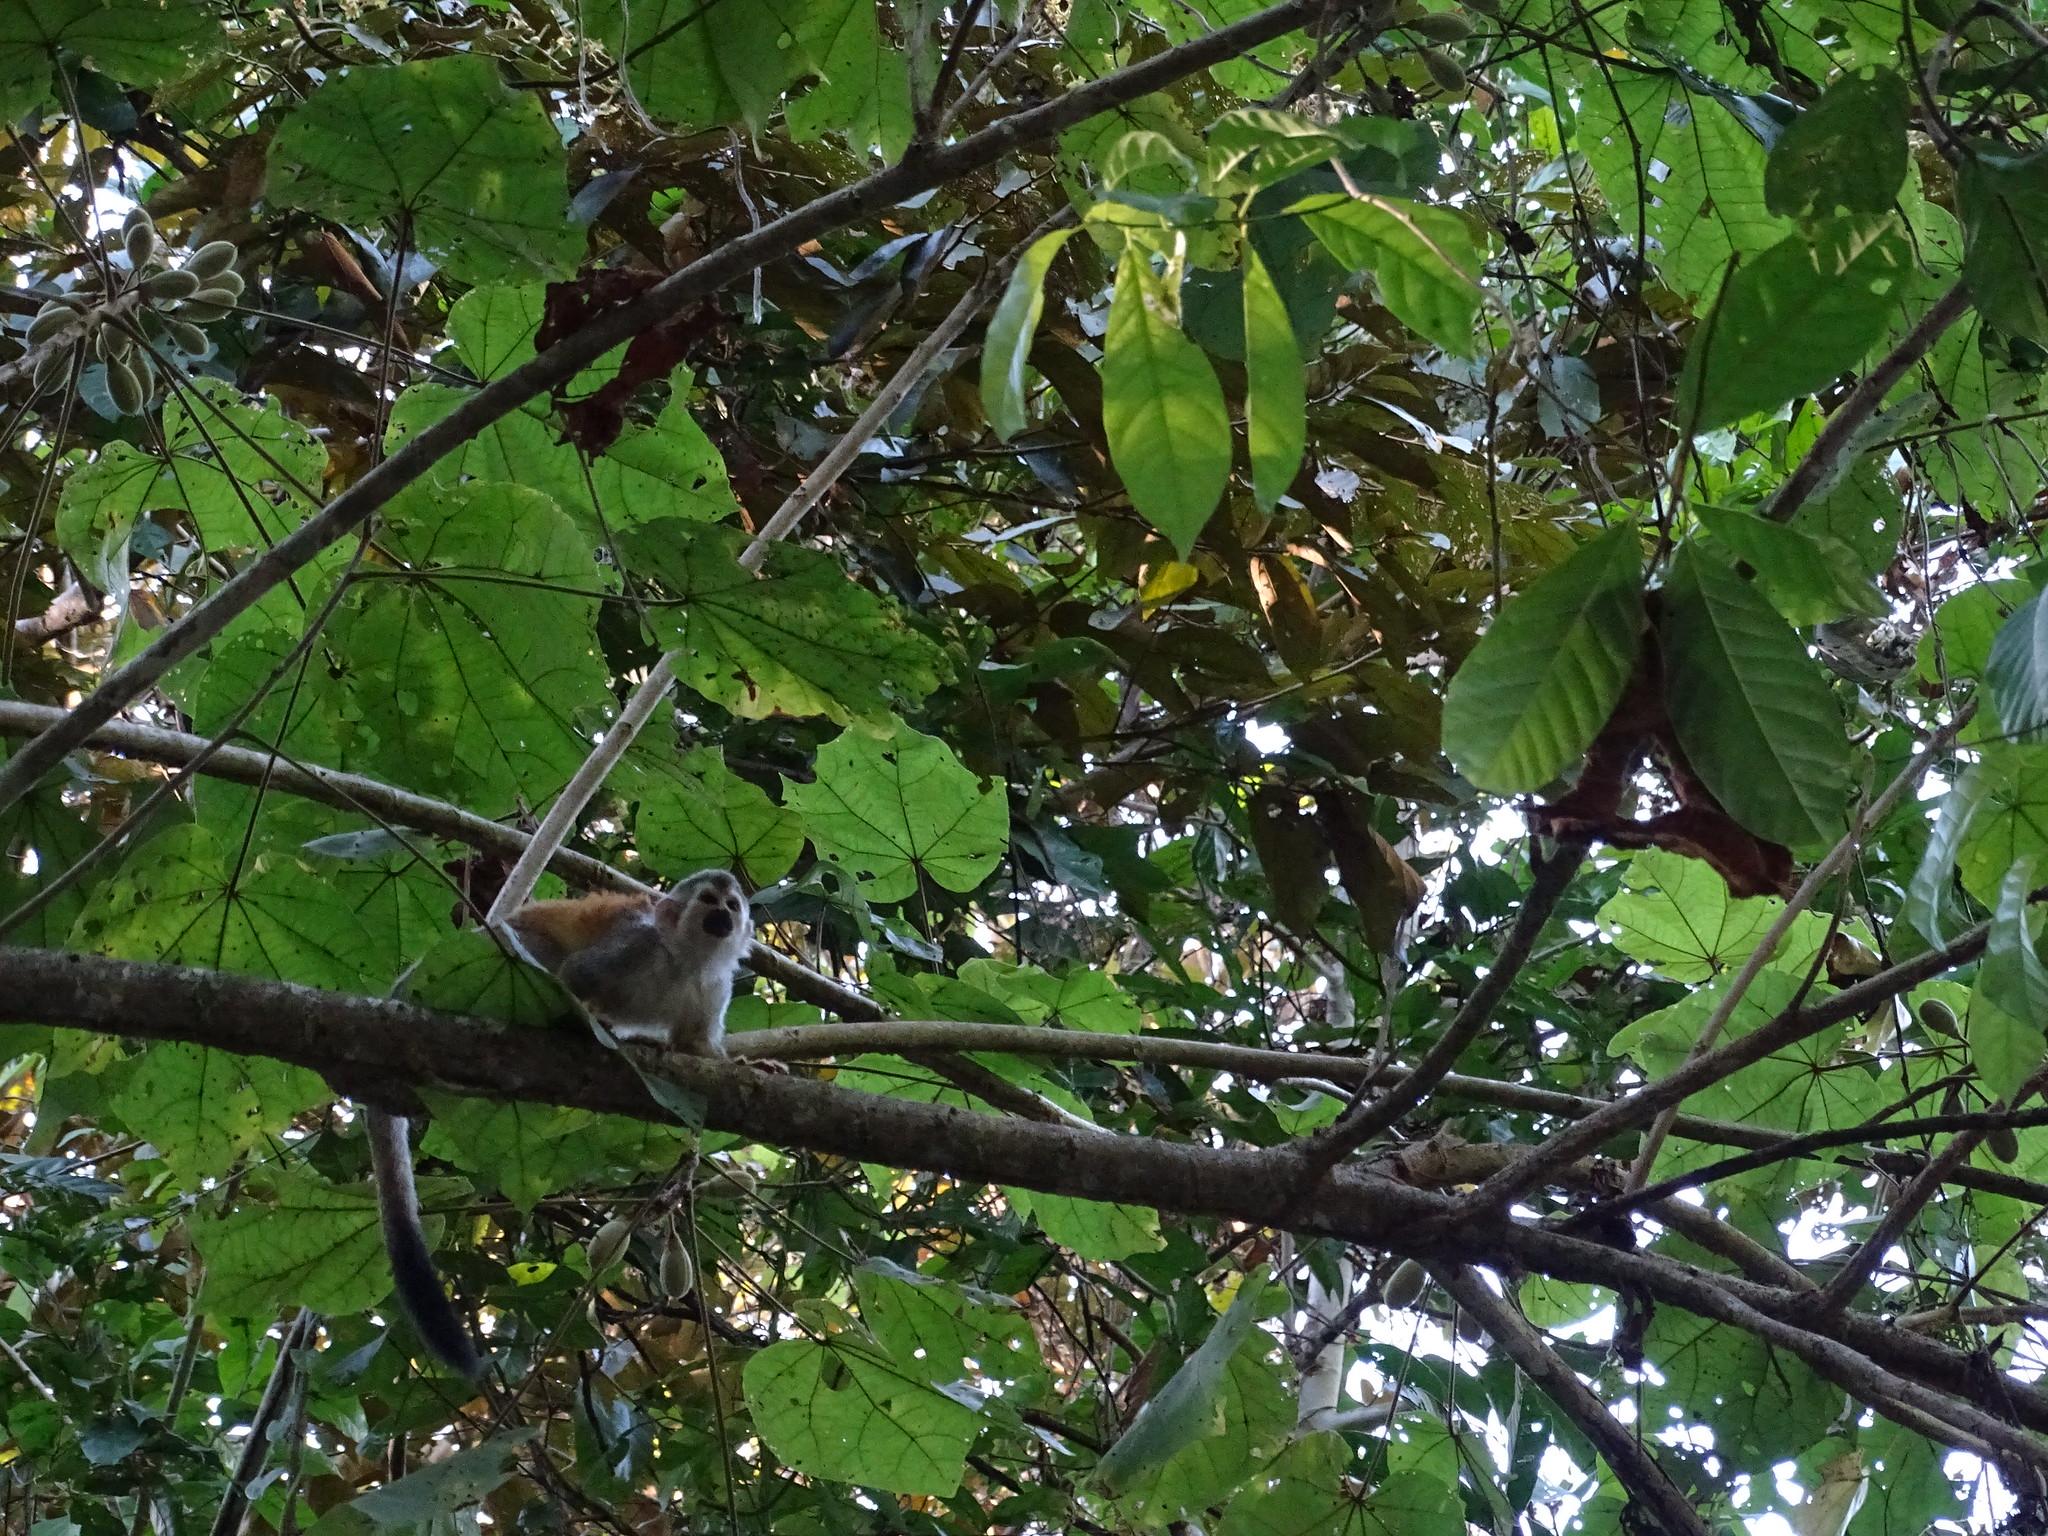 Costa Rica mono Titi Parque Nacional Manuel Antonio